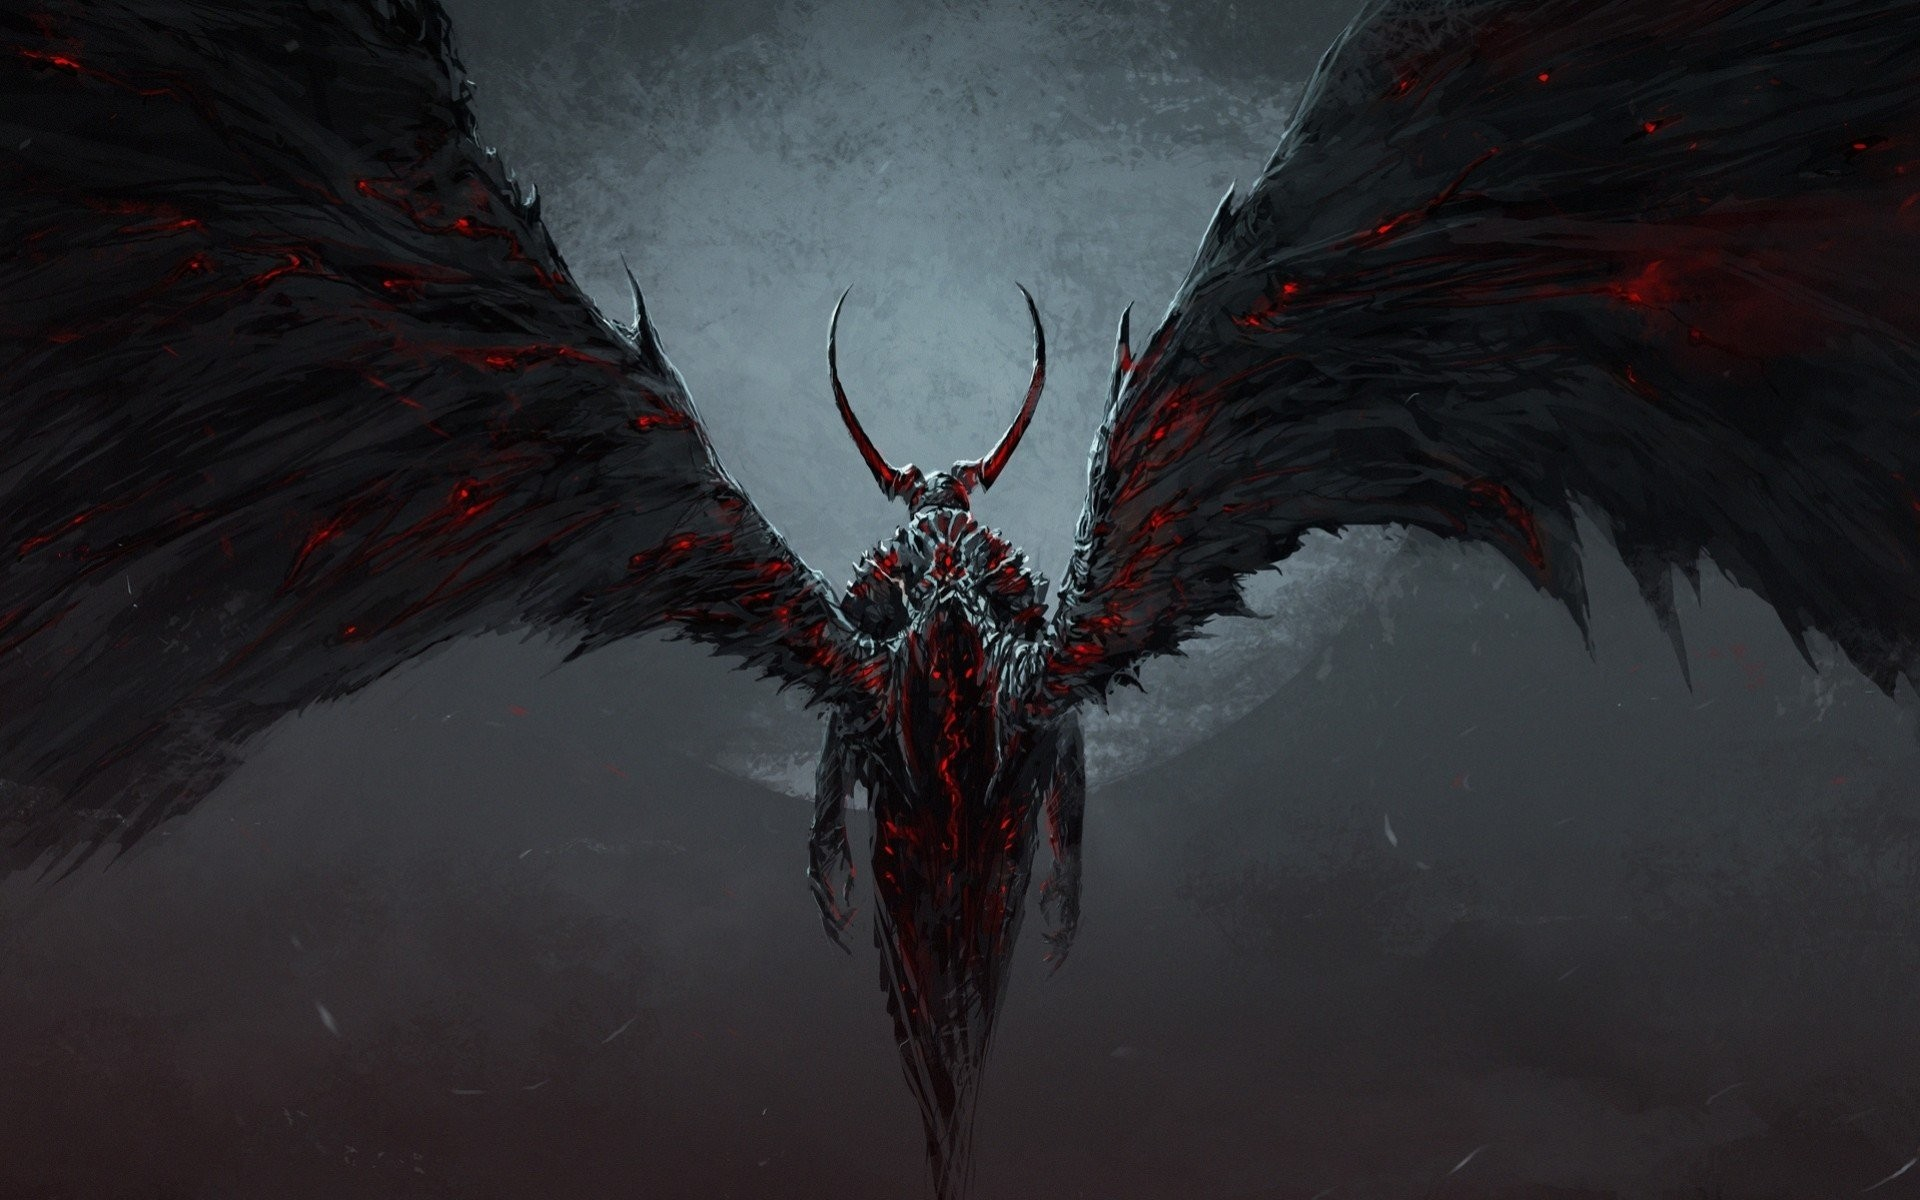 red moon demon - photo #23